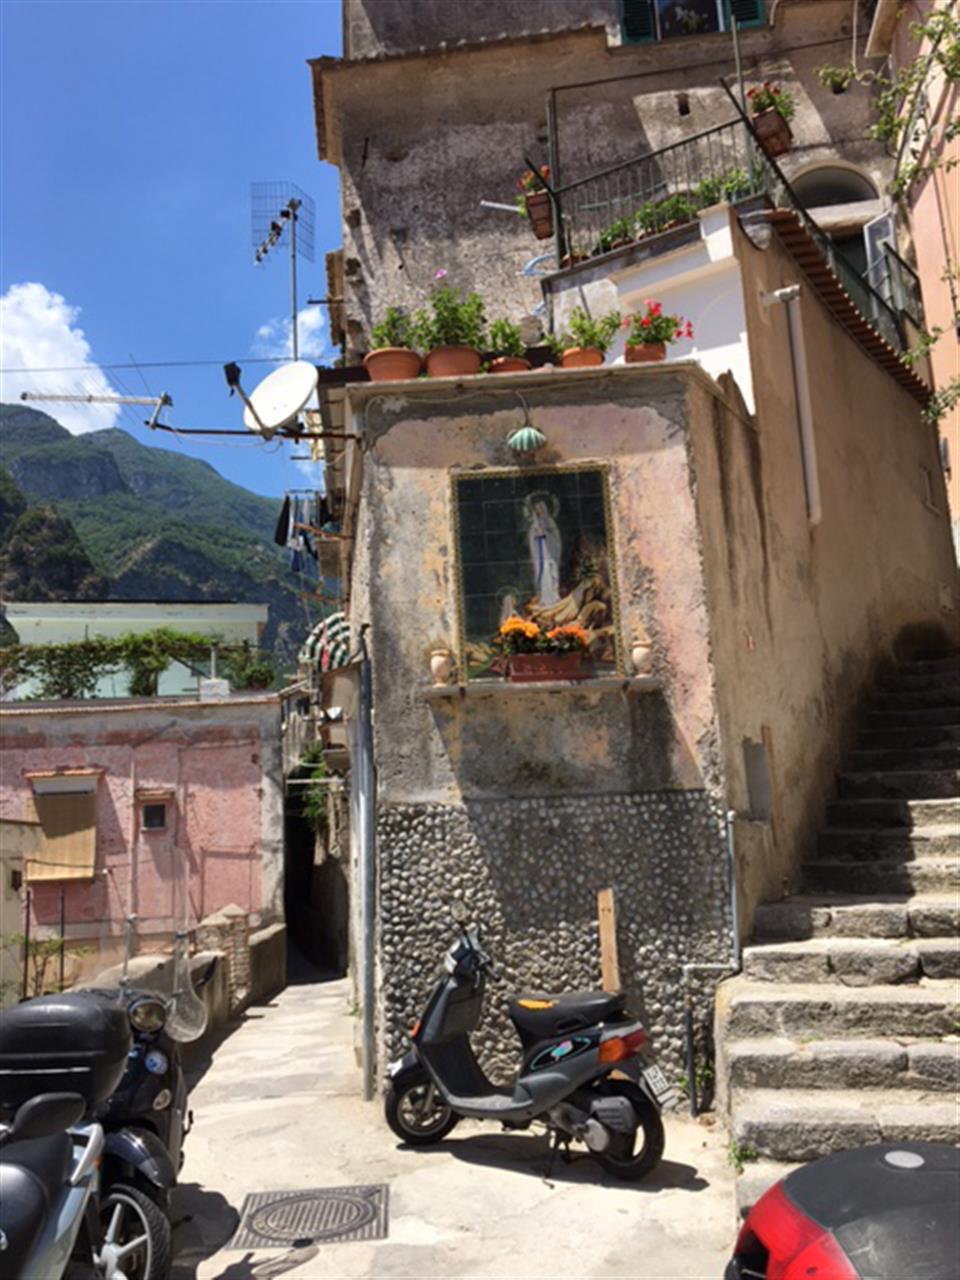 #leadingrelocal #IslandOfCapri #Italy